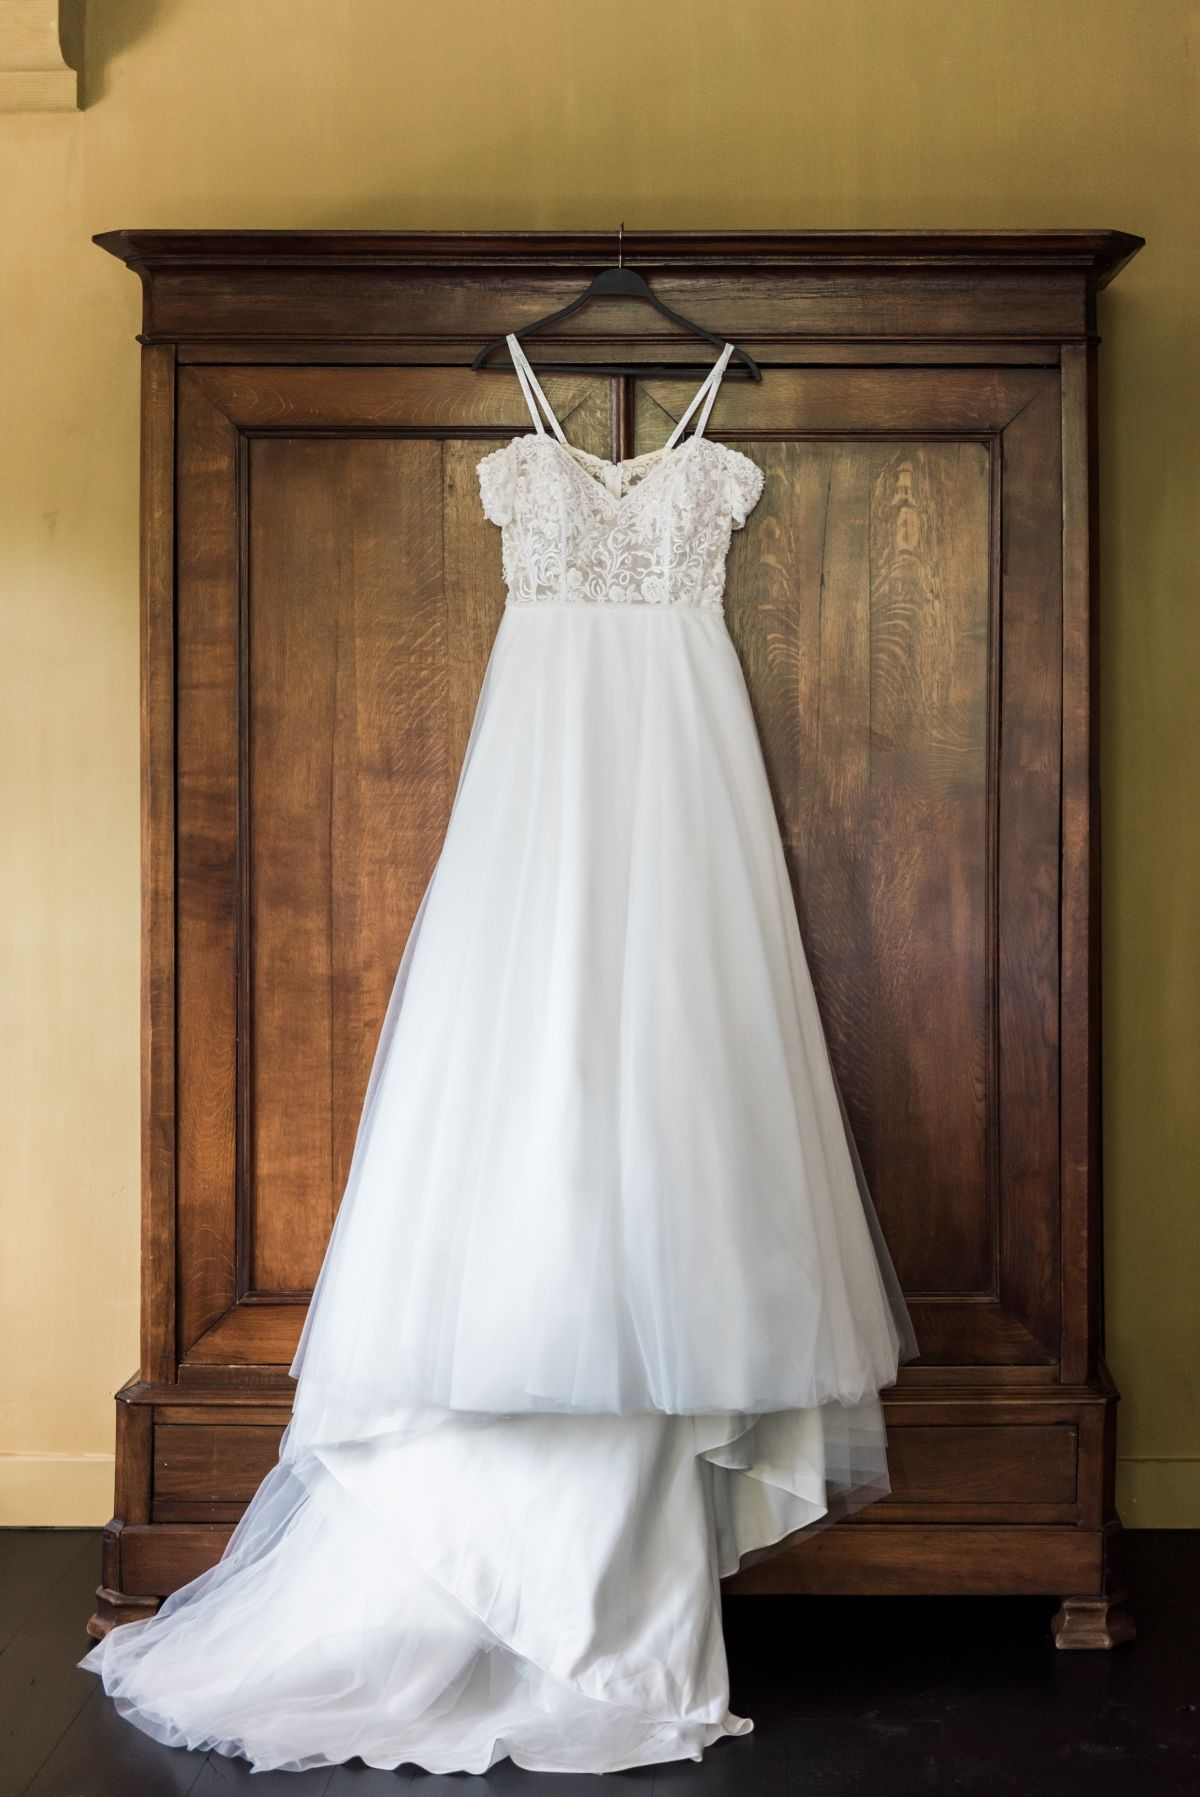 Fresh And Sophisticated Summer Wedding Inspiration Modest Wedding Dresses Vintage Wedding Dresses Unique Wedding Dresses [ 1797 x 1200 Pixel ]